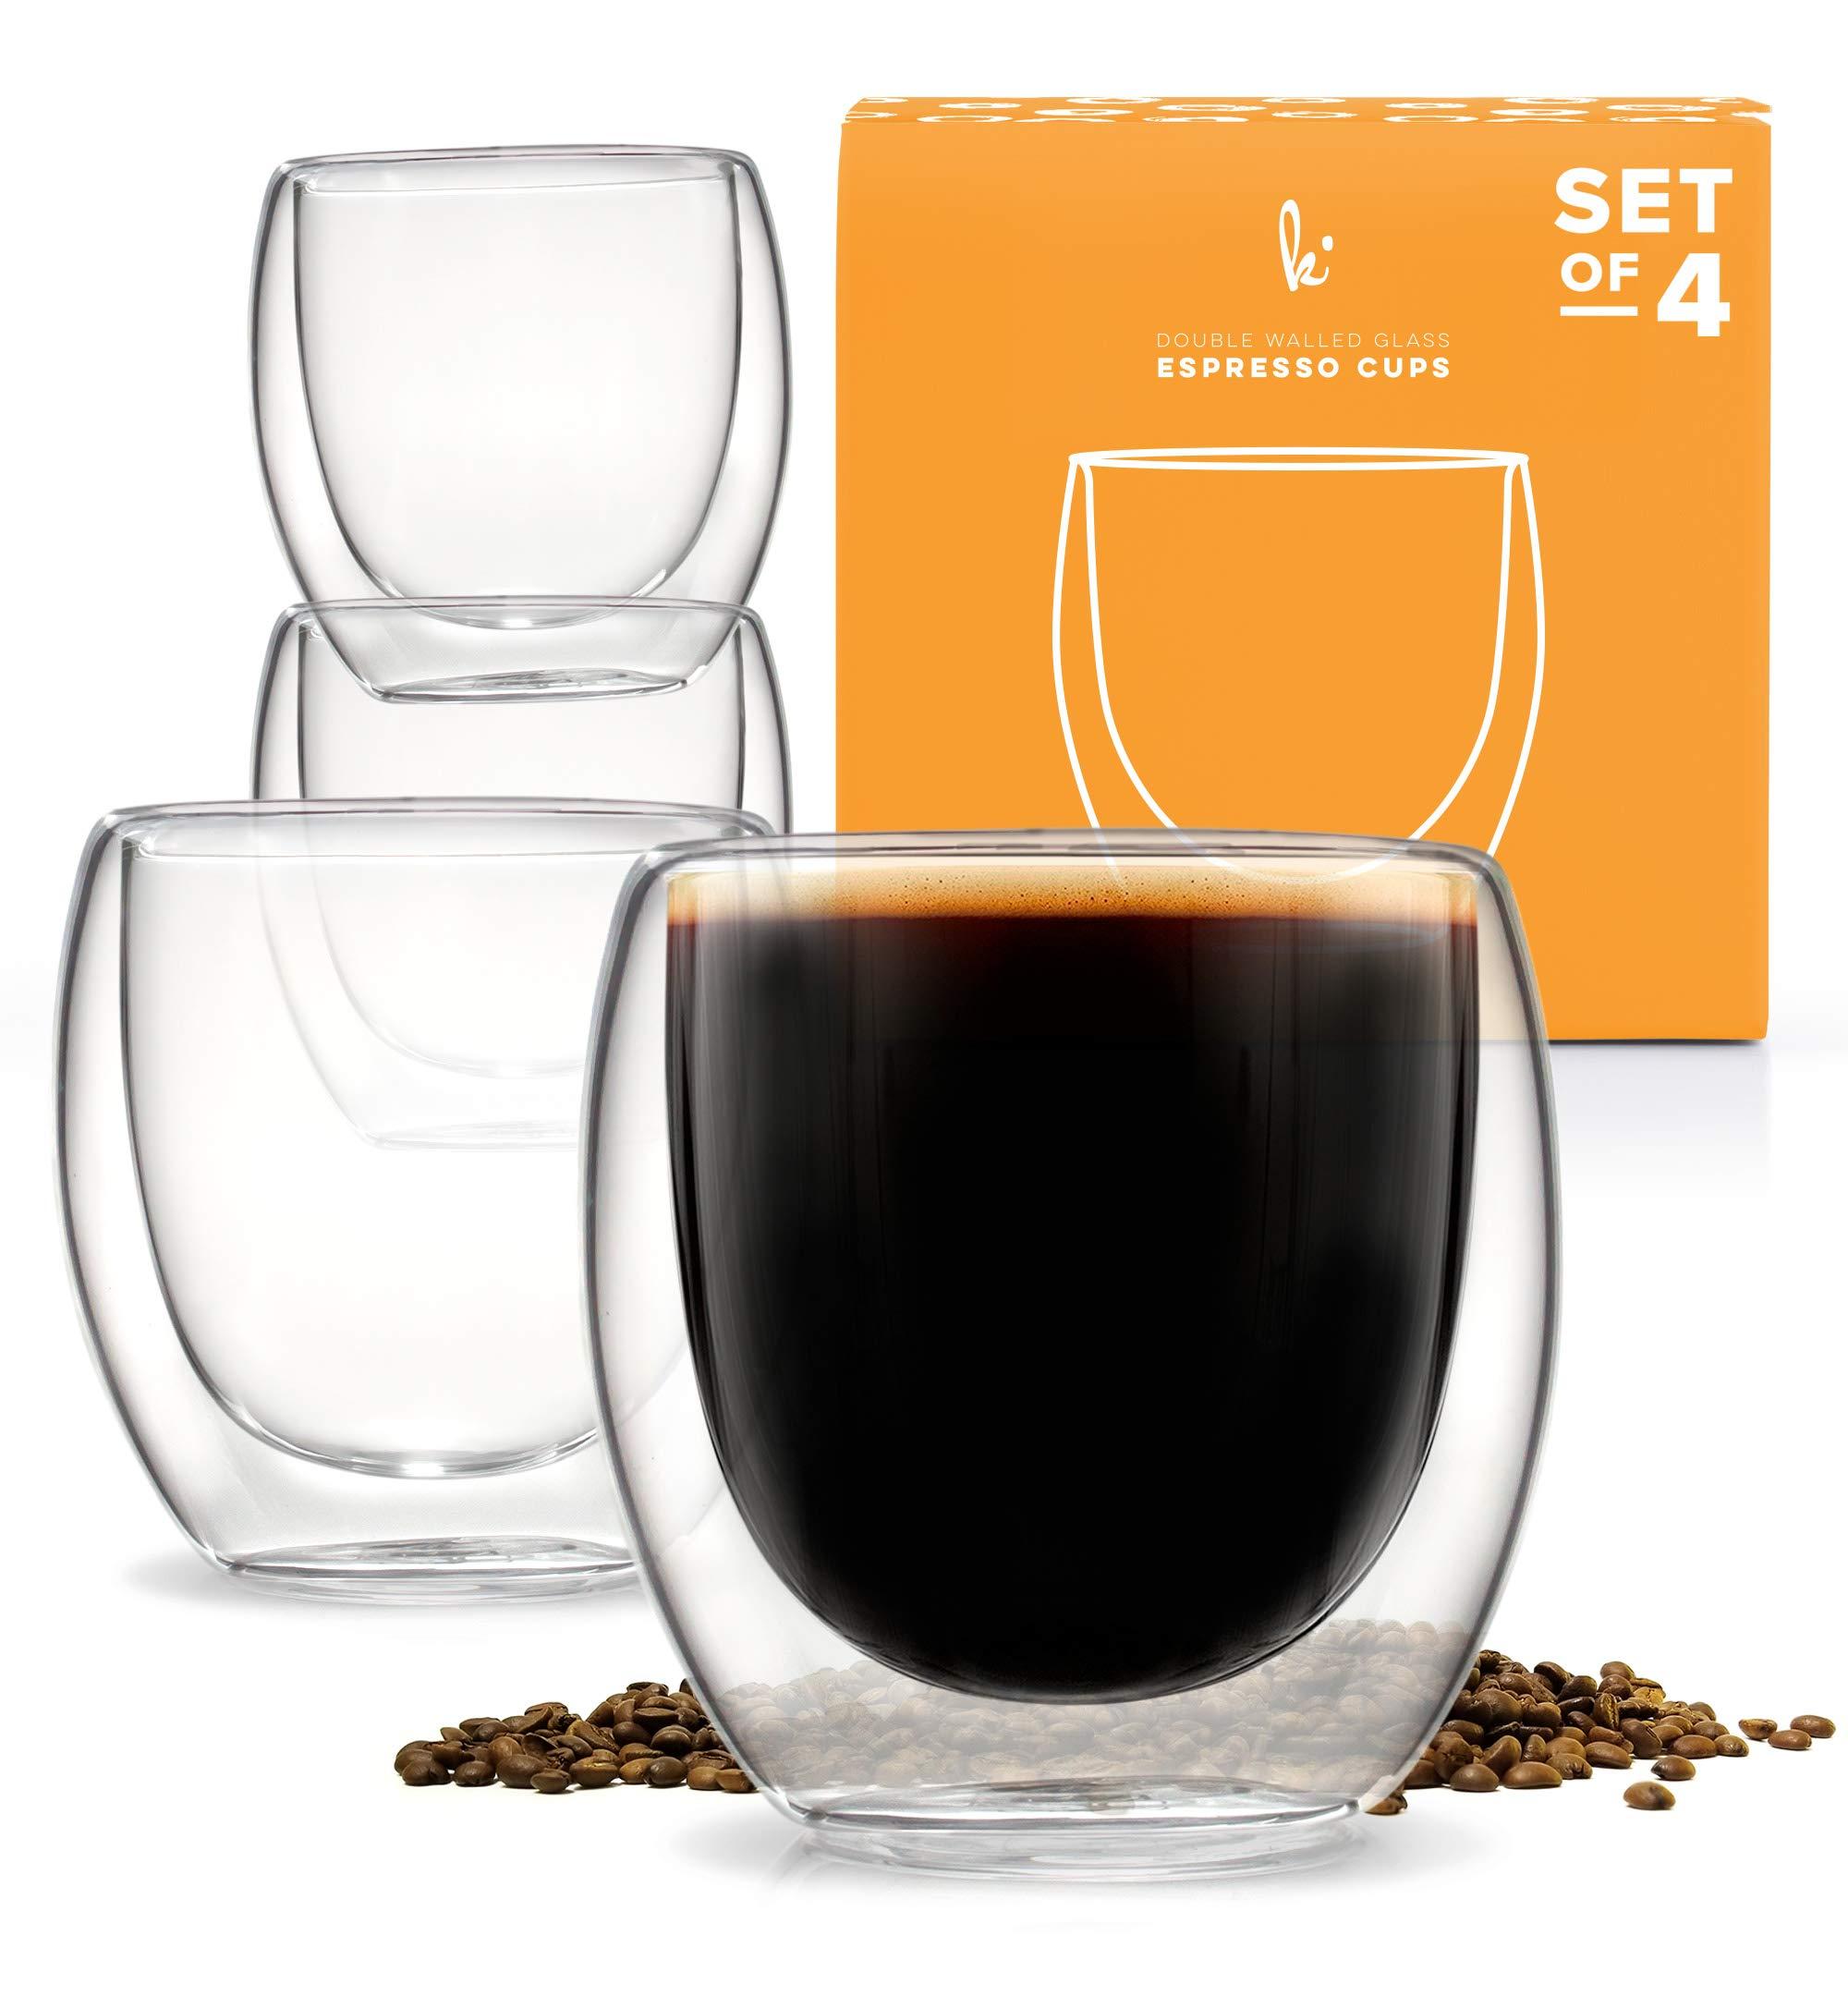 Espresso Cups Shot Glass Coffee